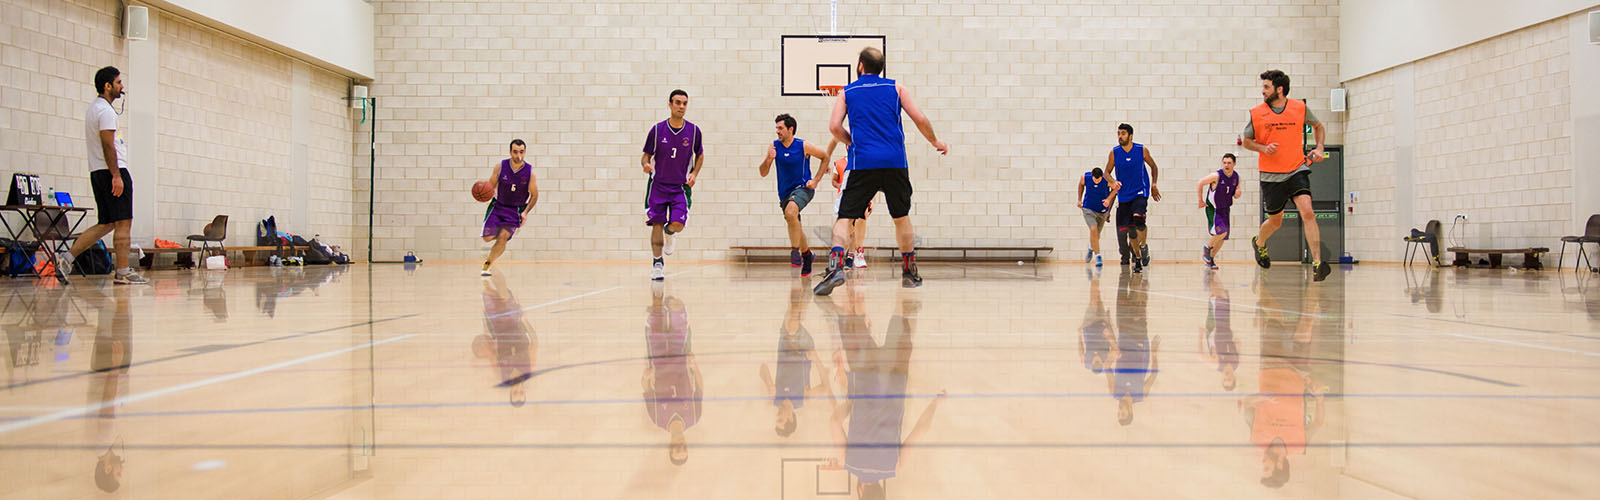 _0036_GOMammoth-Basketball-London